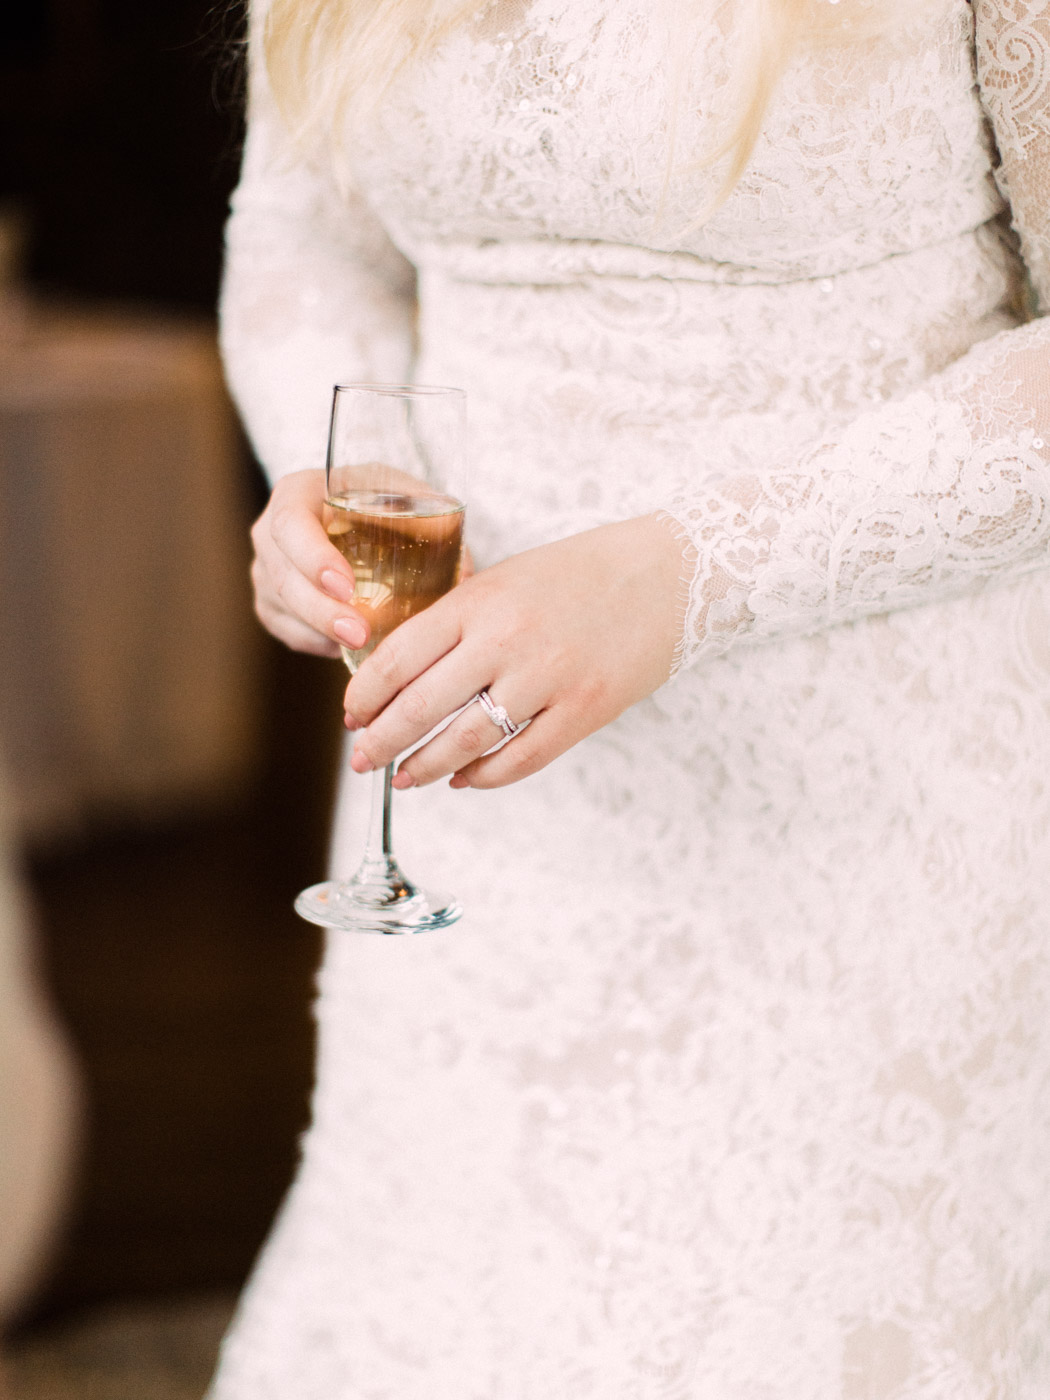 Toronto-wedding-photographer-intimate-classic-fine-art-elopement-ottawa75.jpg